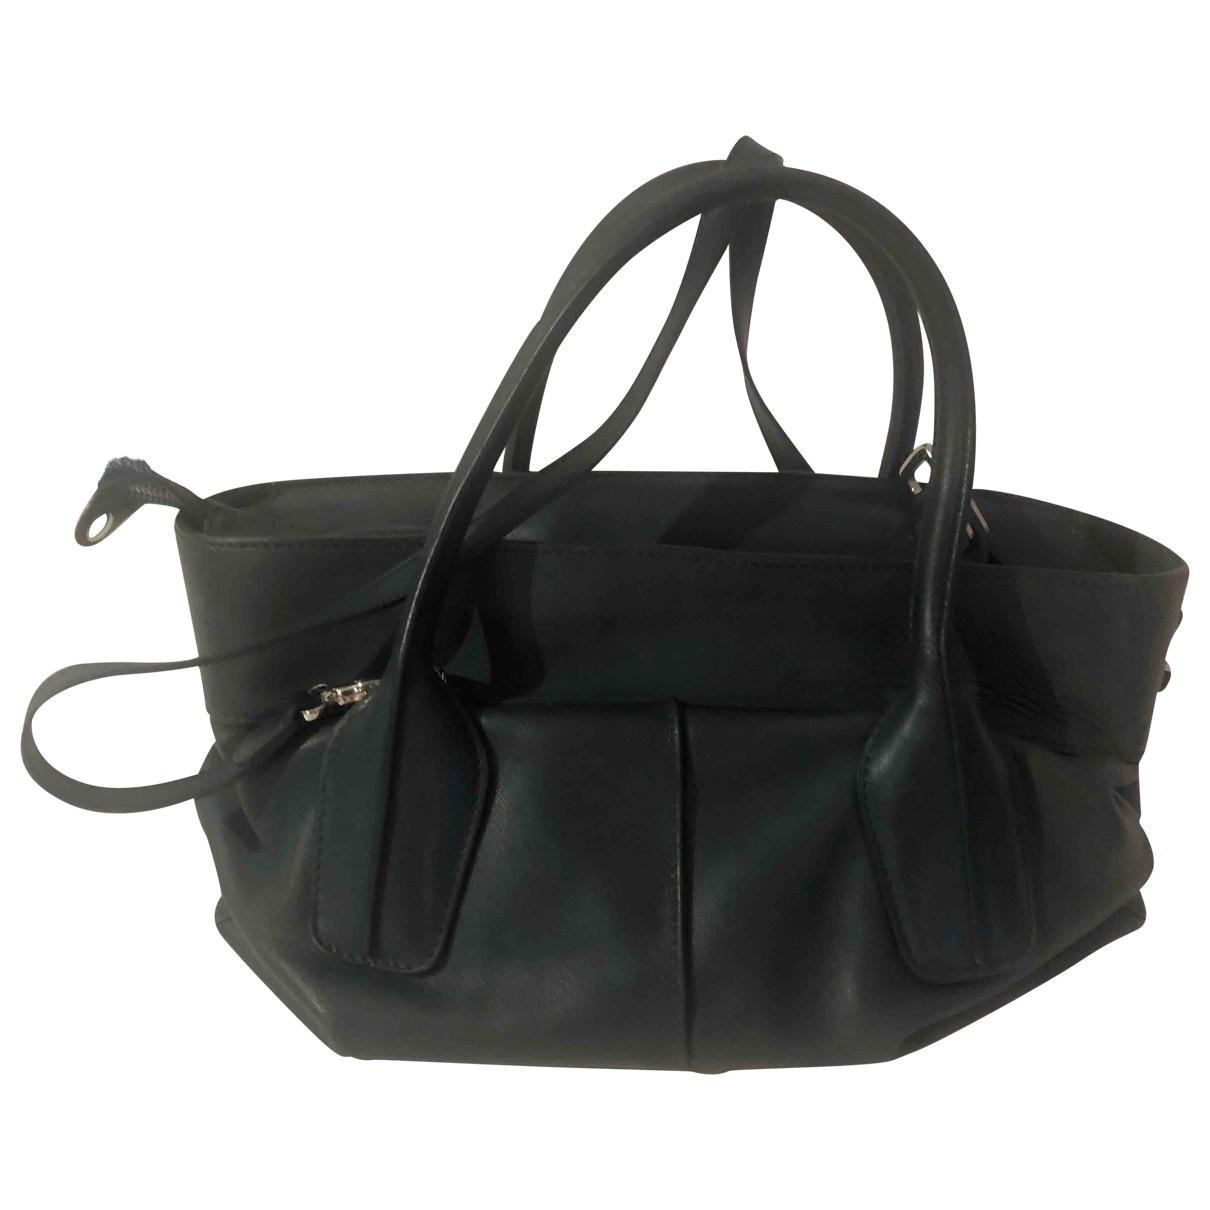 Tod's \N Green Leather handbag for Women \N